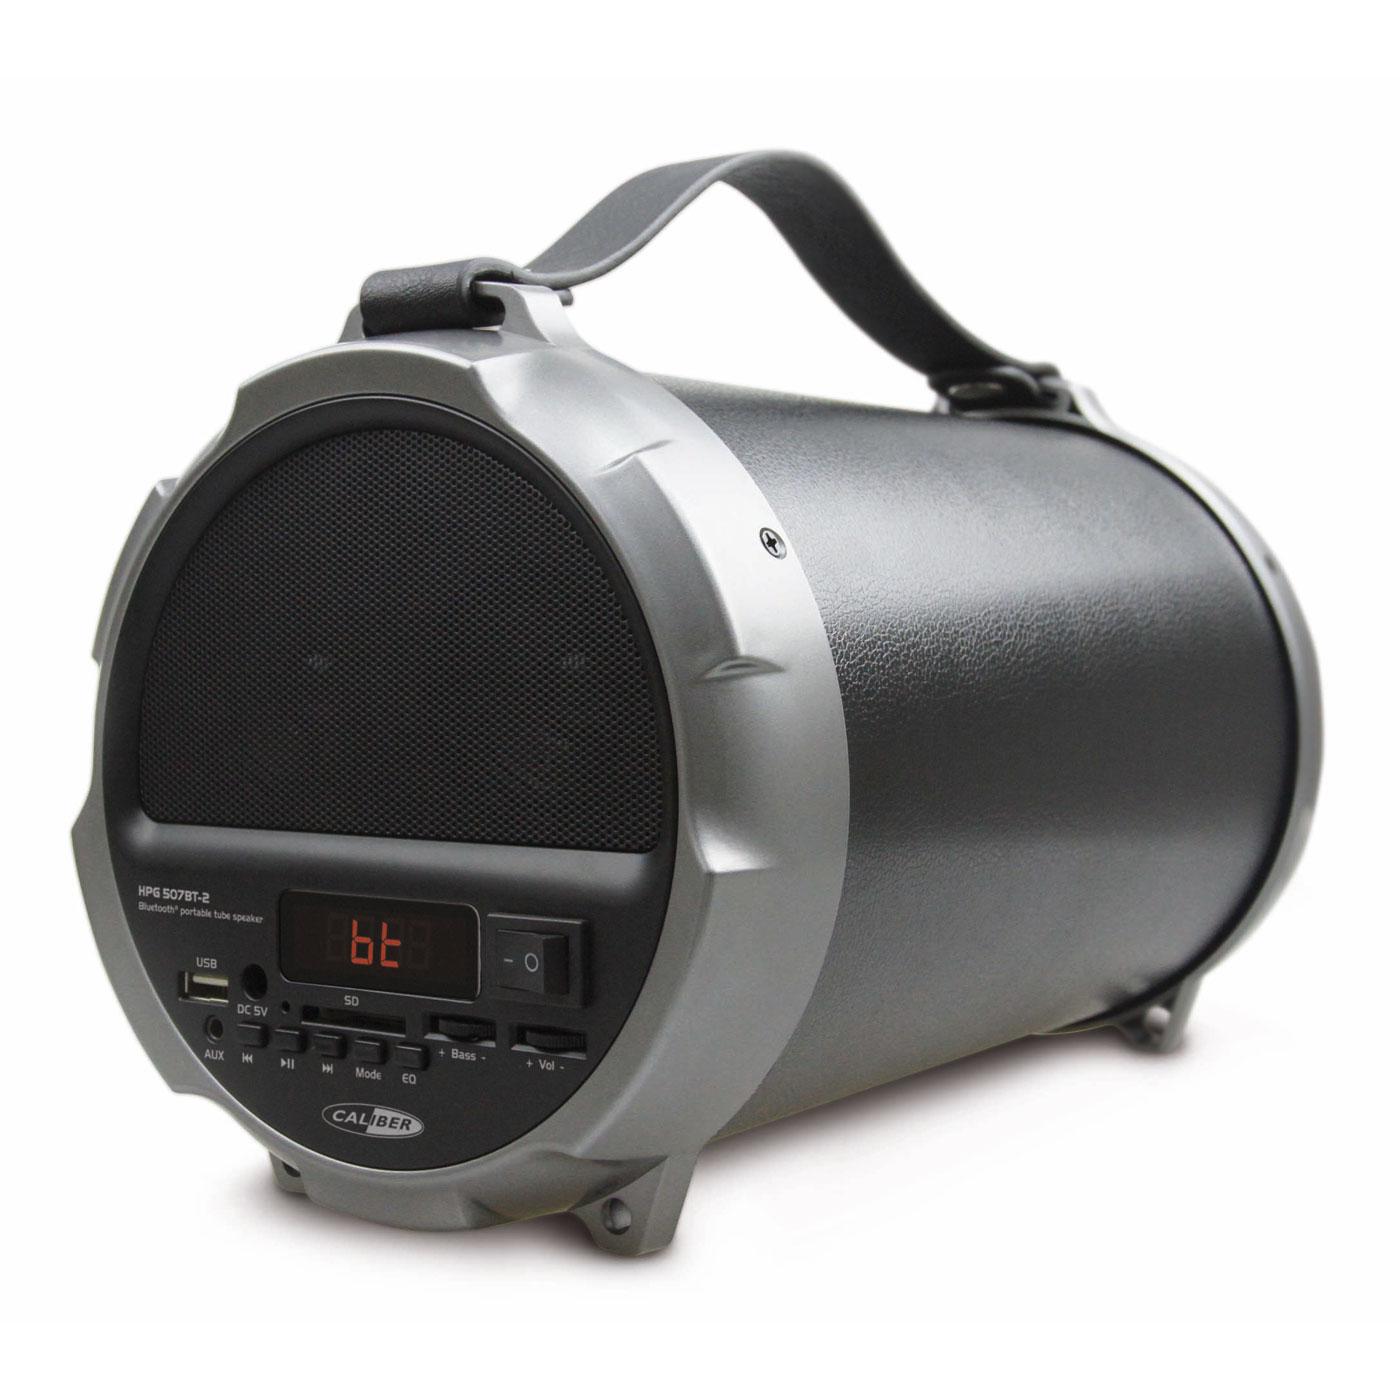 Enceinte Bluetooth Caliber HPG507BT-2 Haut-parleur tube Bluetooth portatif avec batterie intégrée